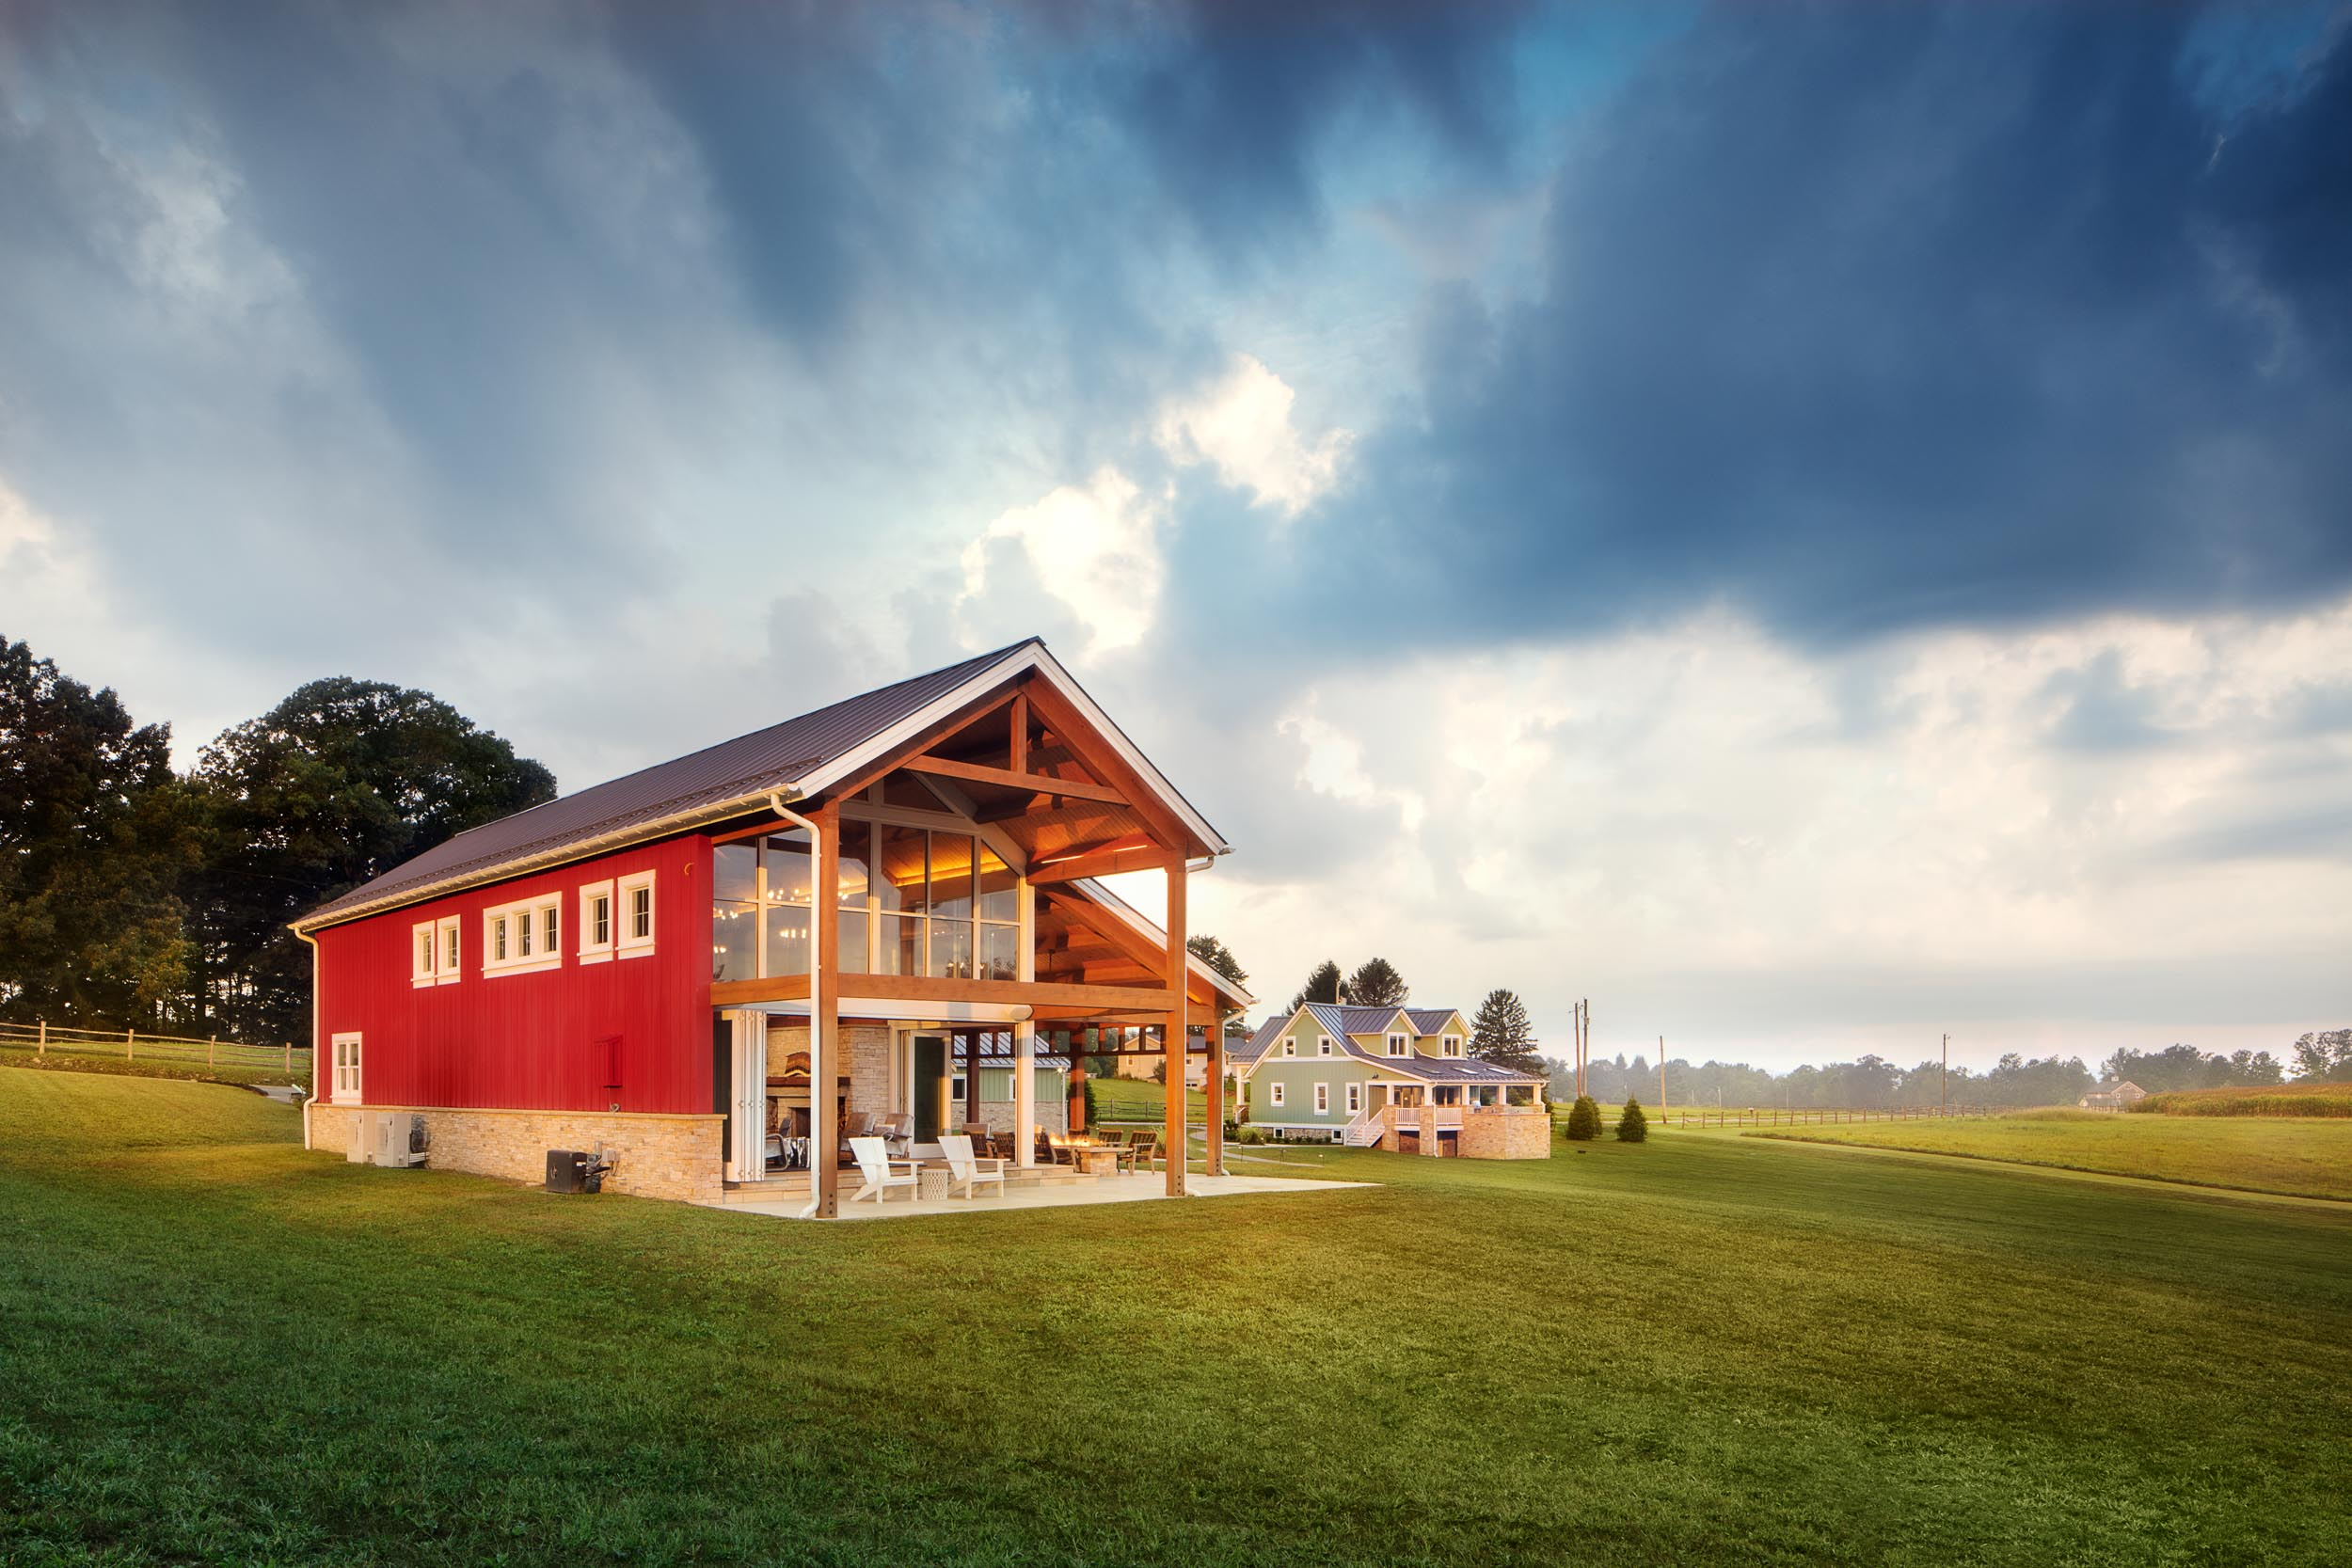 home_barn_upscale_country_grealish-9.jpg